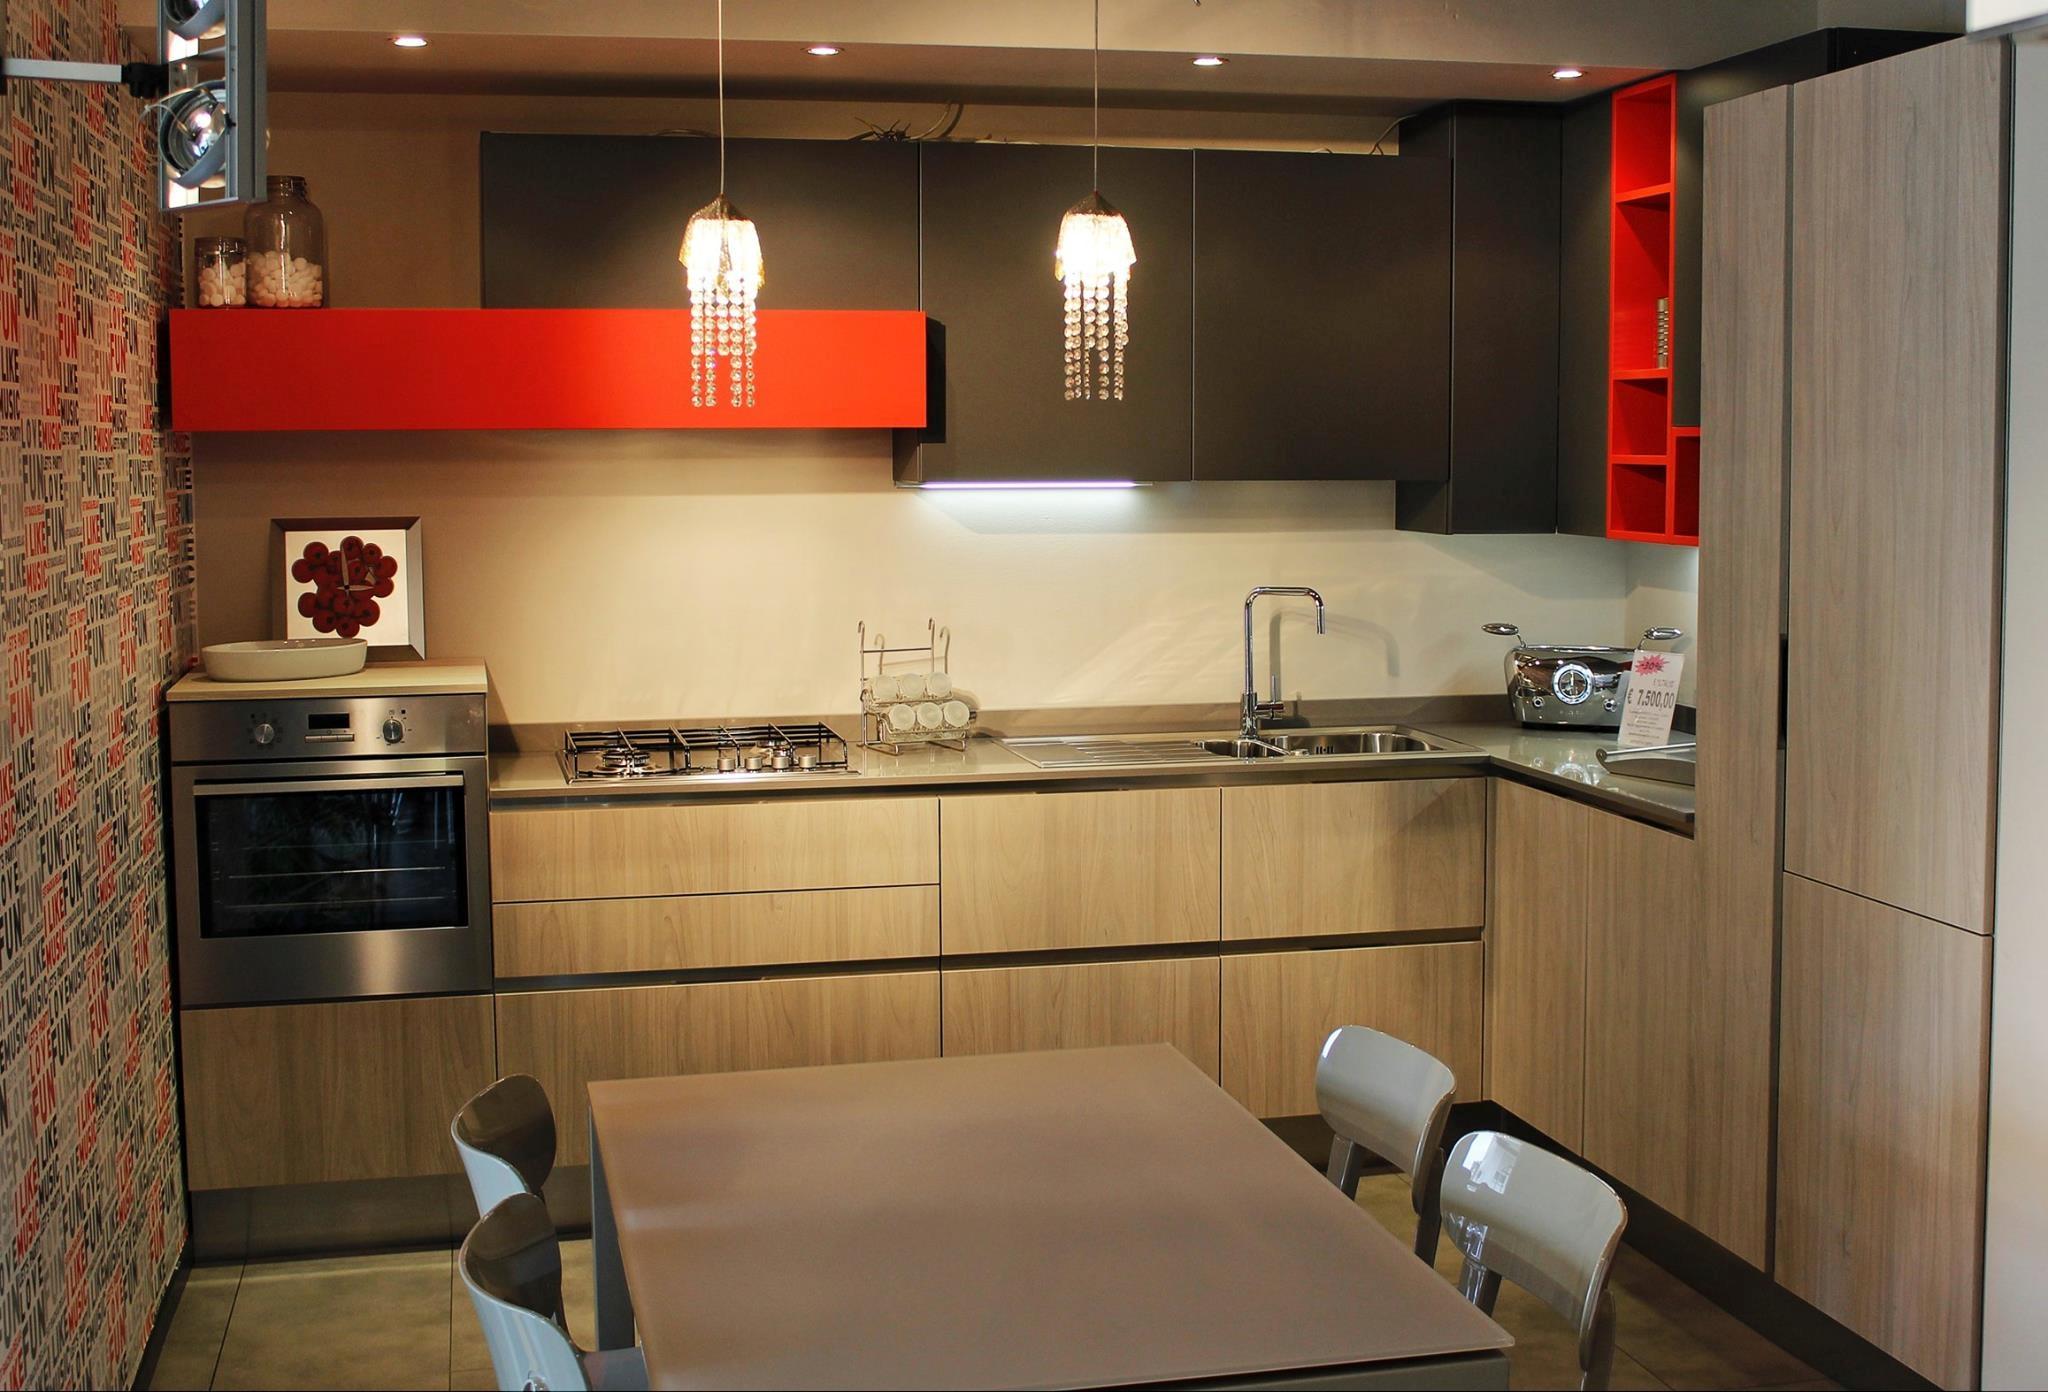 Cucina arredo3 linea luna moderna cucine a prezzi scontati for Cucina verona arredo 3